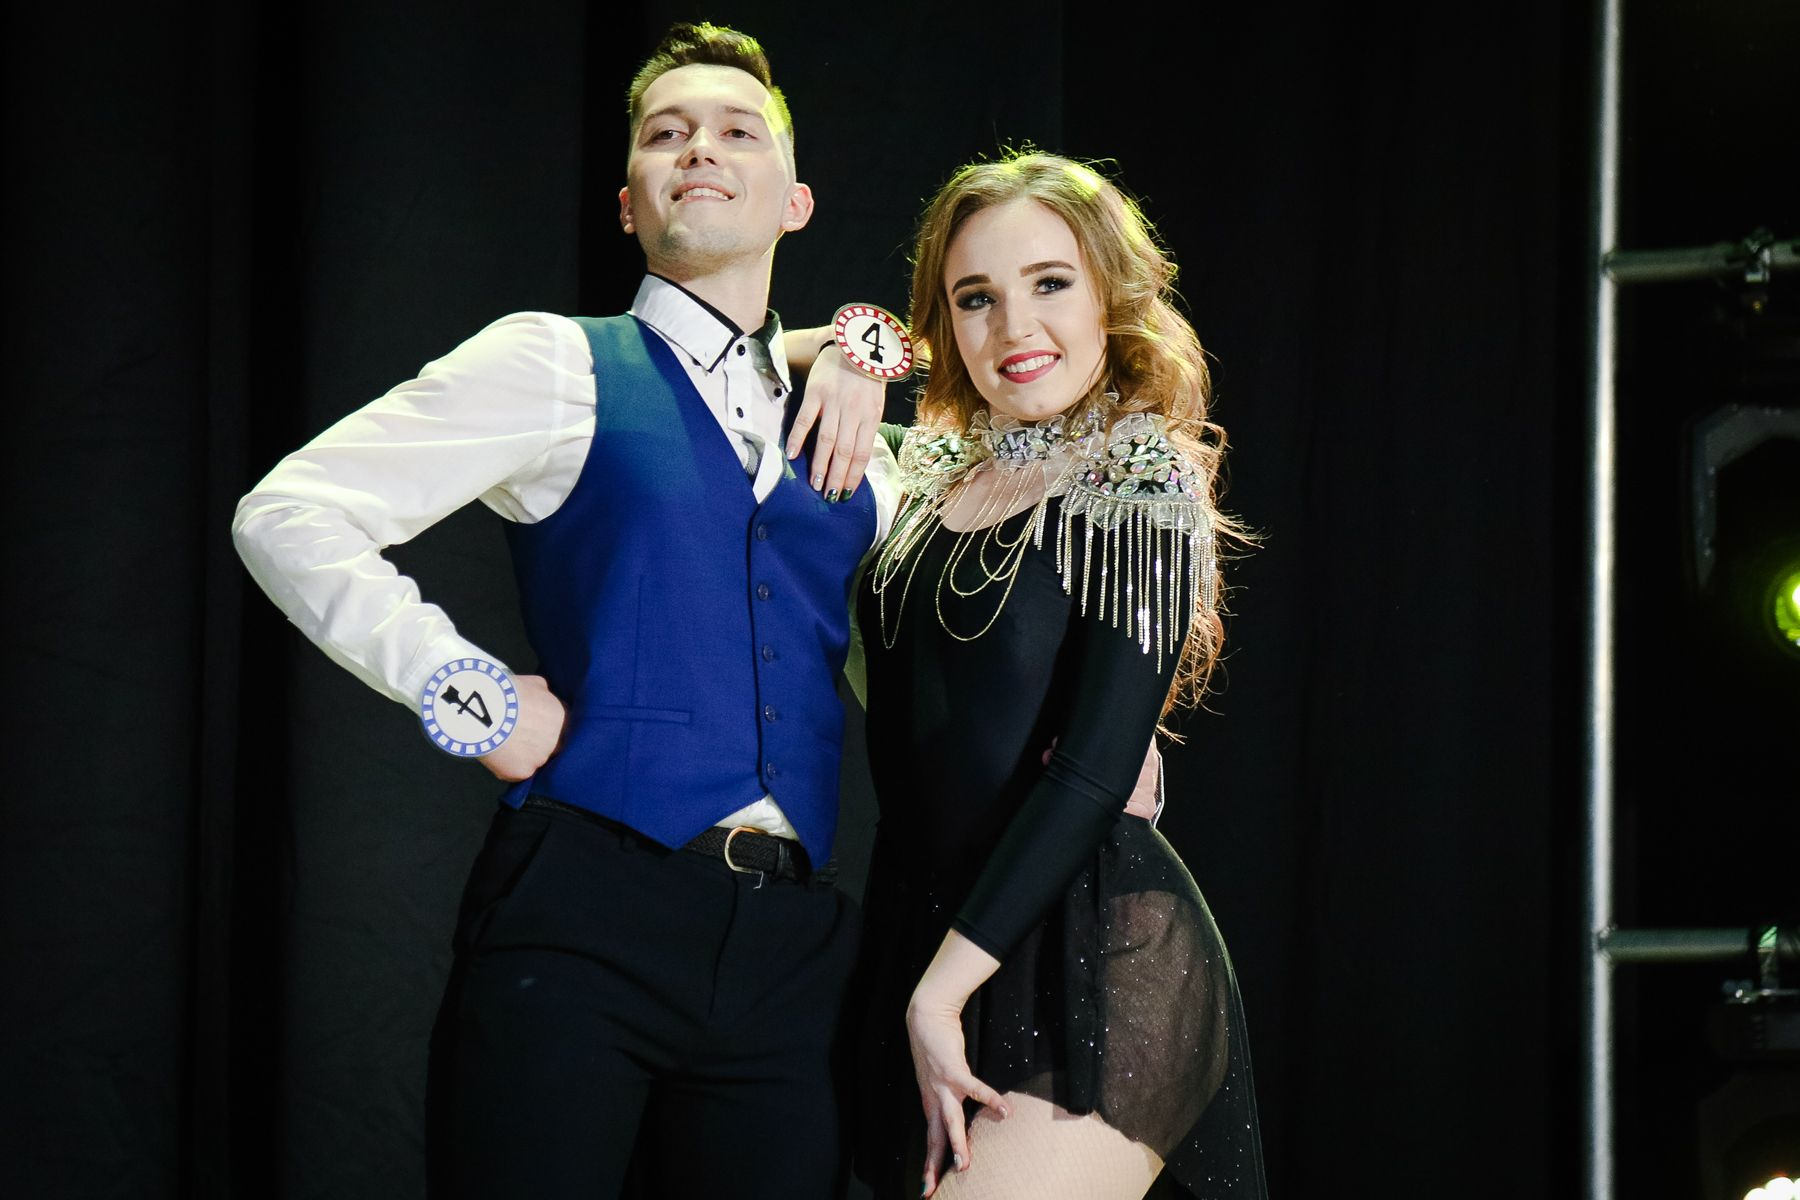 Милена Стефанюк и Владимир Елисеев - Мисс и Мистер ВГУЭС 2018